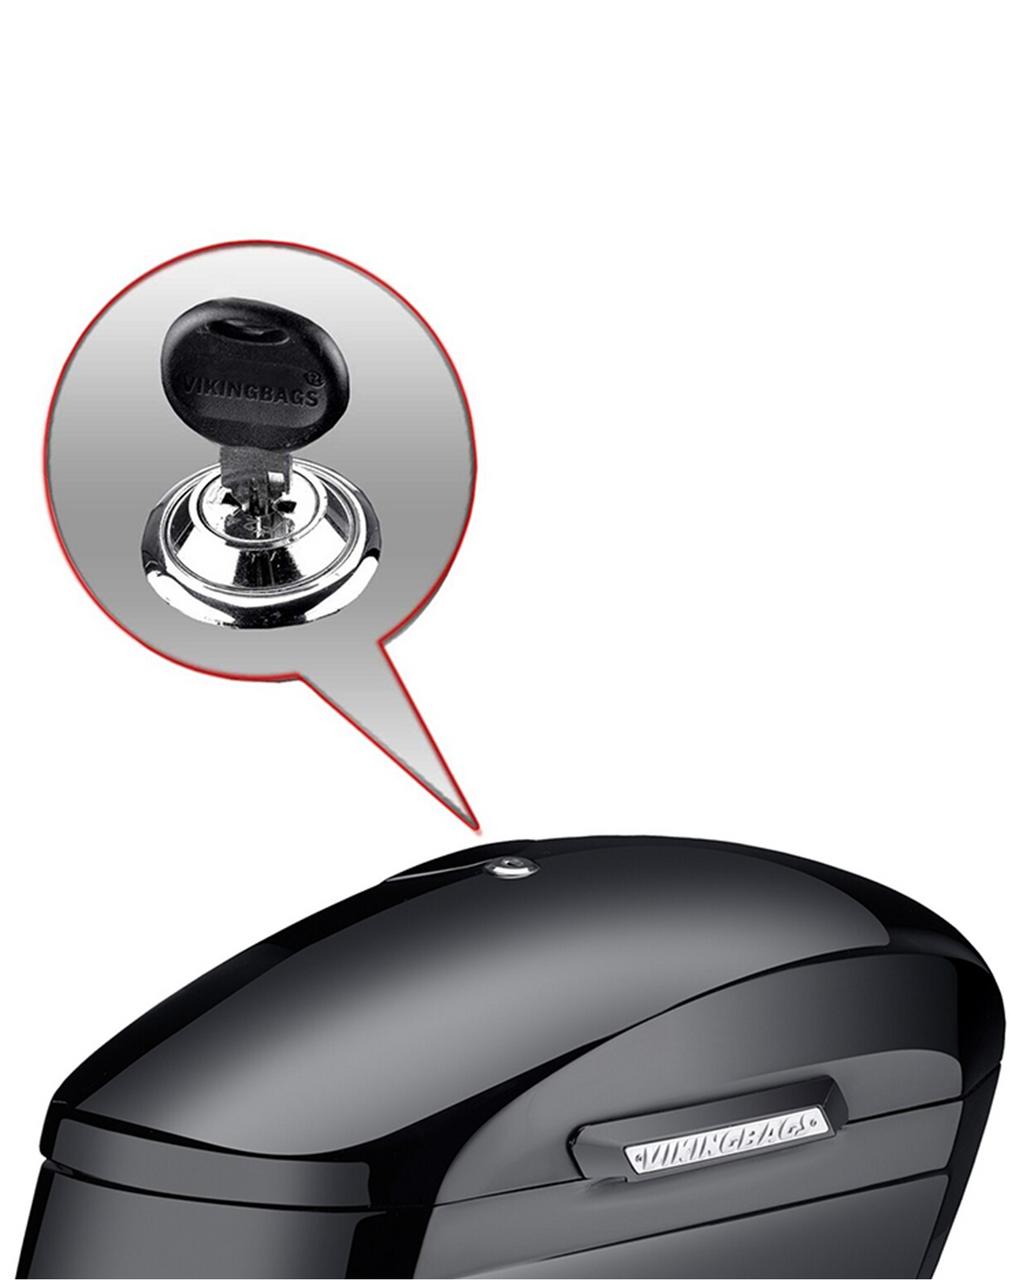 Yamaha V Star 650 Custom, XVS65T Viking Lamellar Extra Large Painted Non-Shock Cutout Saddlebags Key Lock View